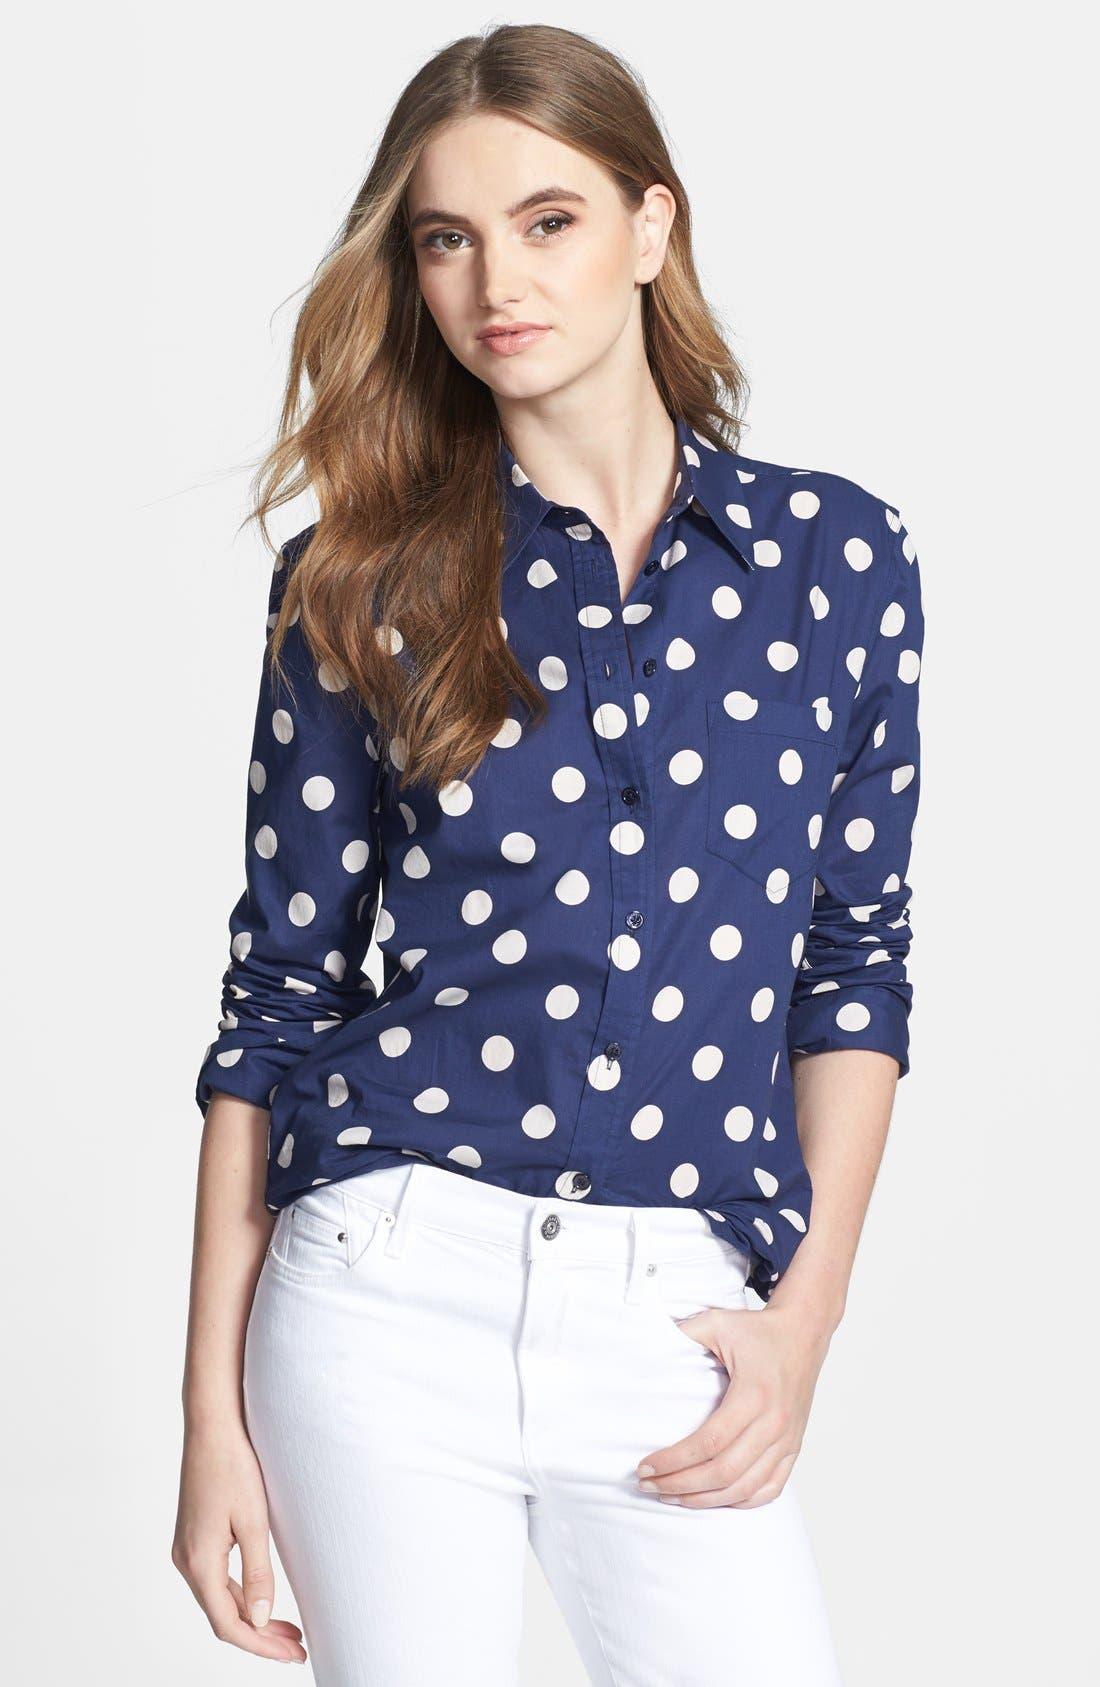 Main Image - Equipment 'Reese' Polka Dot Cotton Shirt